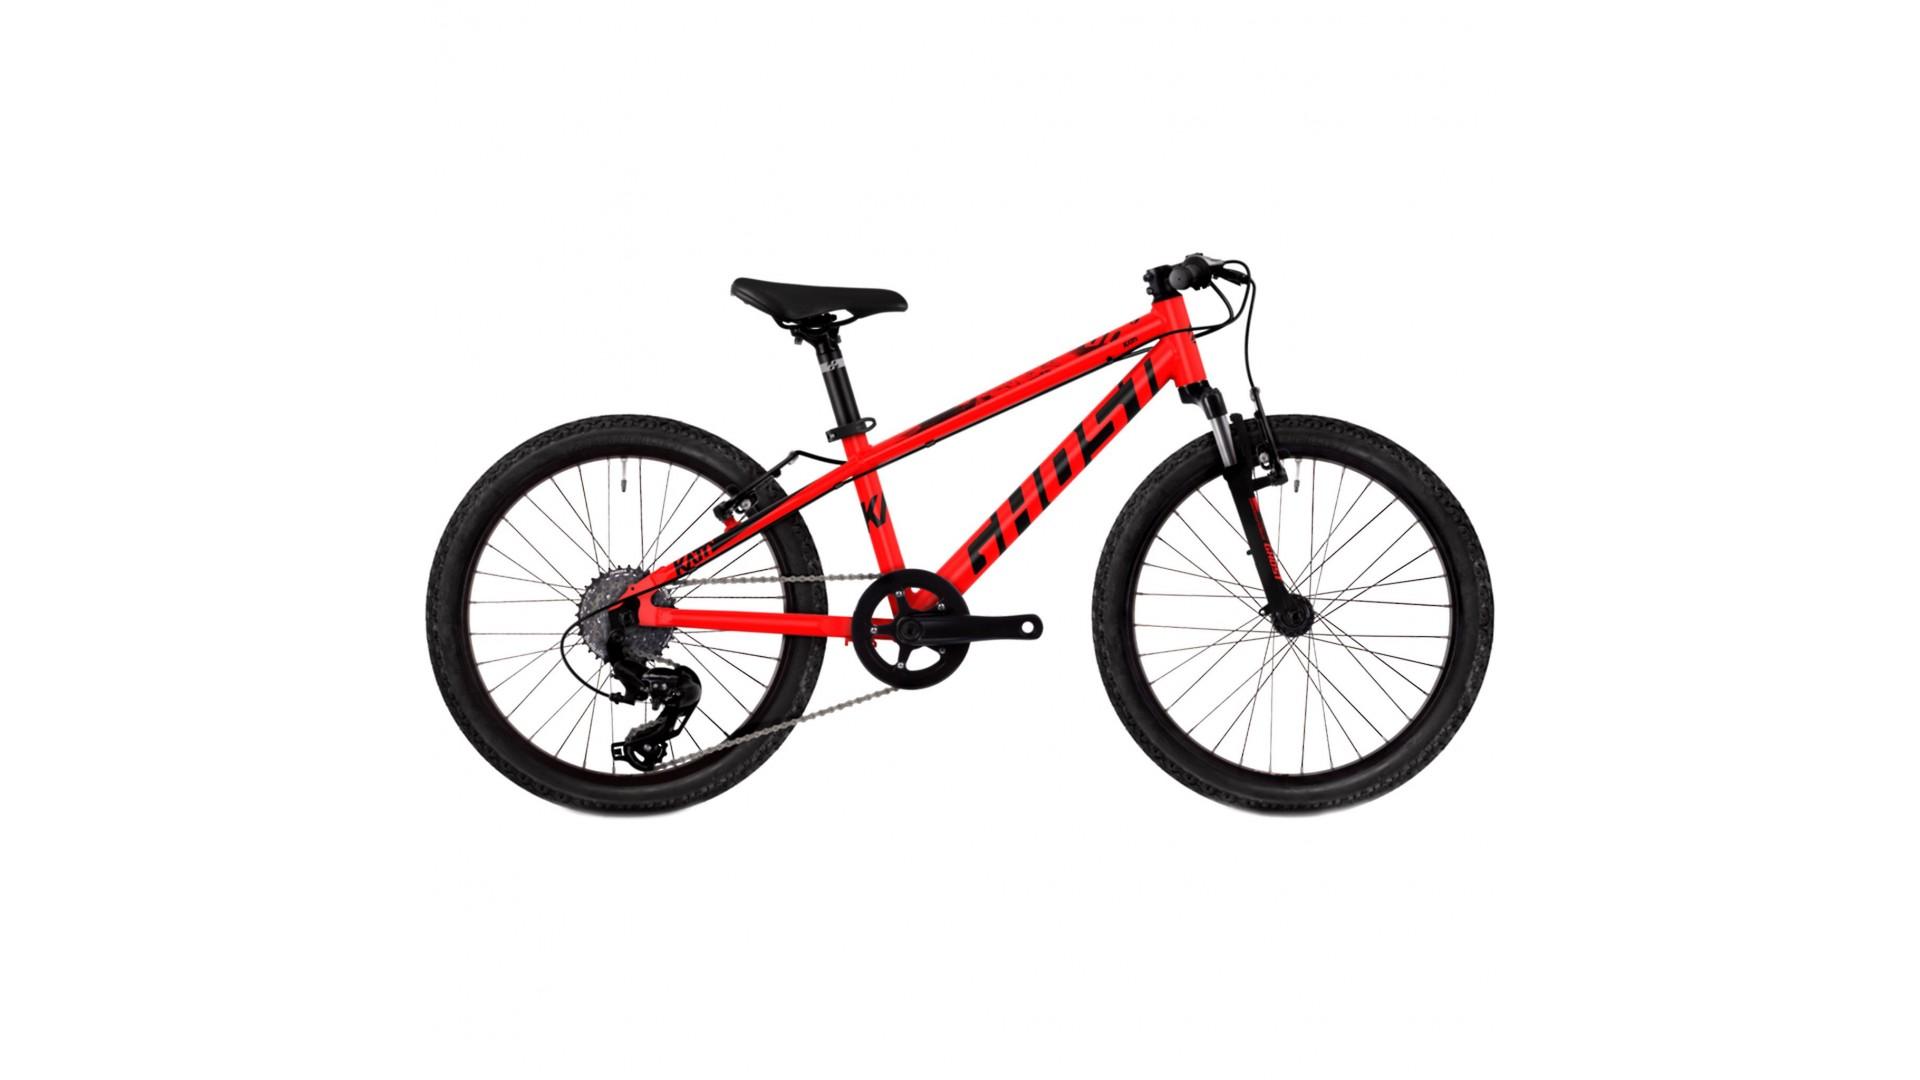 Детский велосипед GHOST Kato 2.0 AL U RED / BLK год 2018